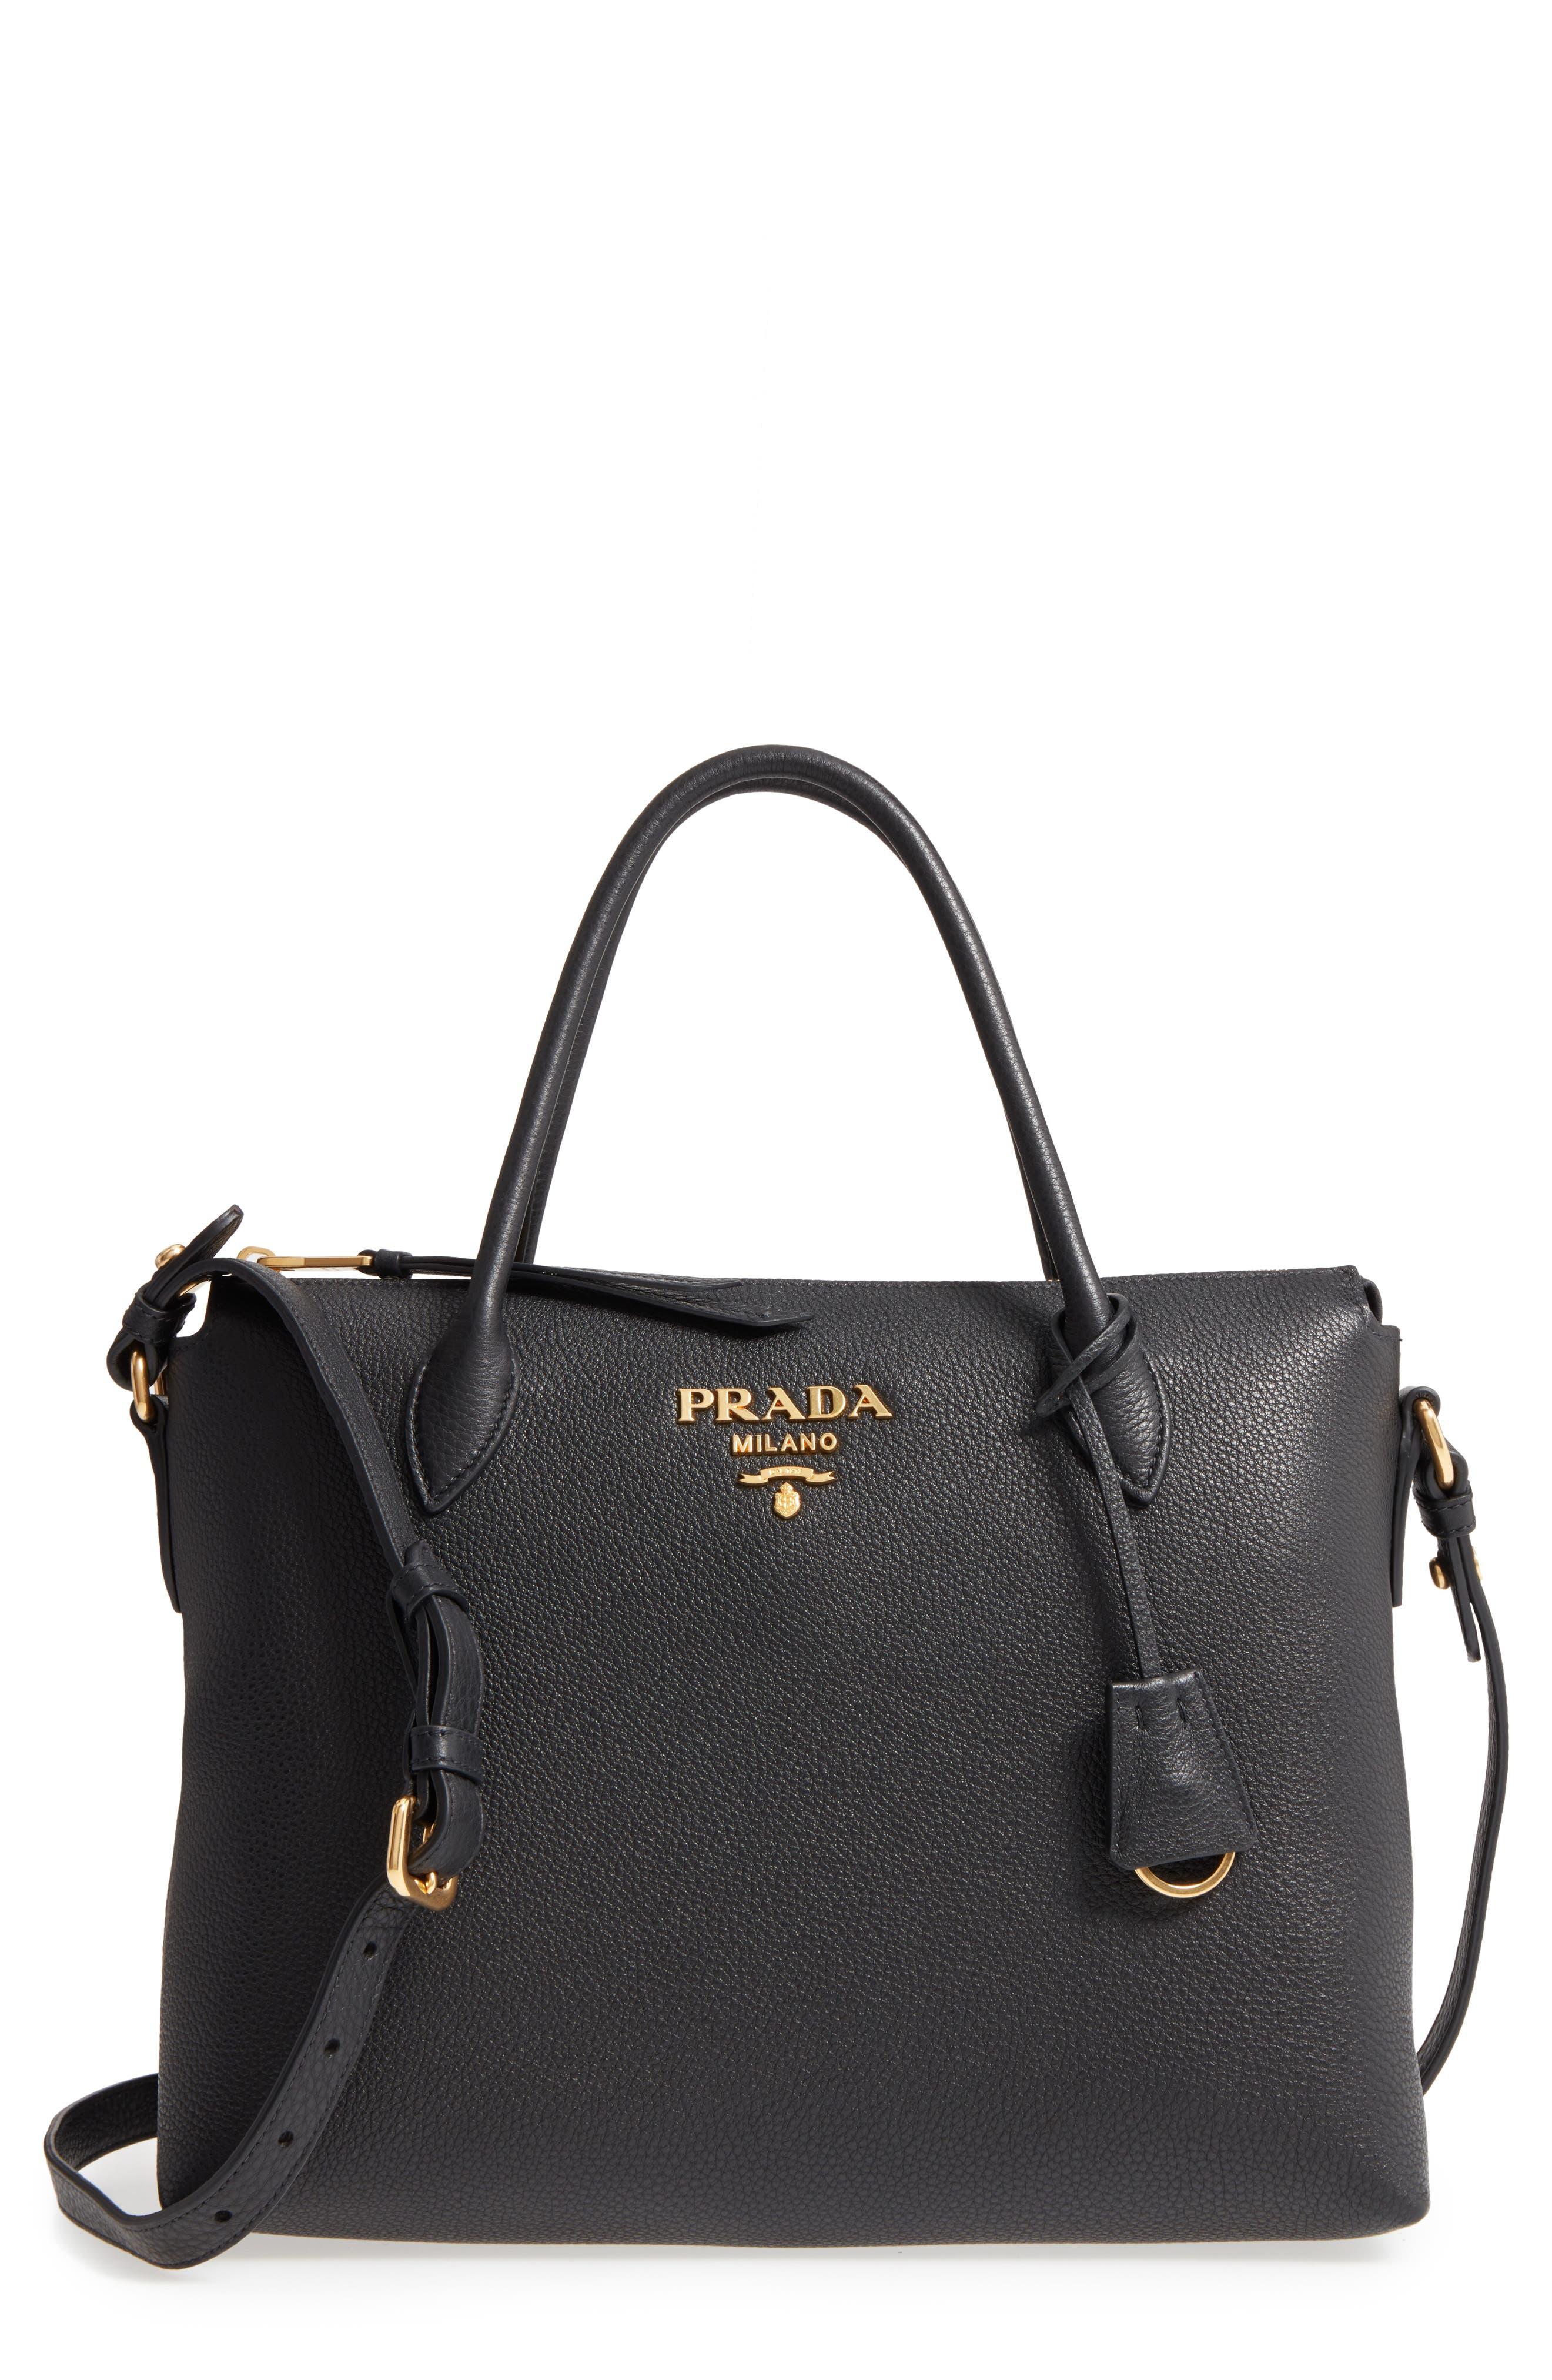 8baebb28fa0d Prada daino leather shoulder bag nordstrom jpeg 780x838 Bag daino